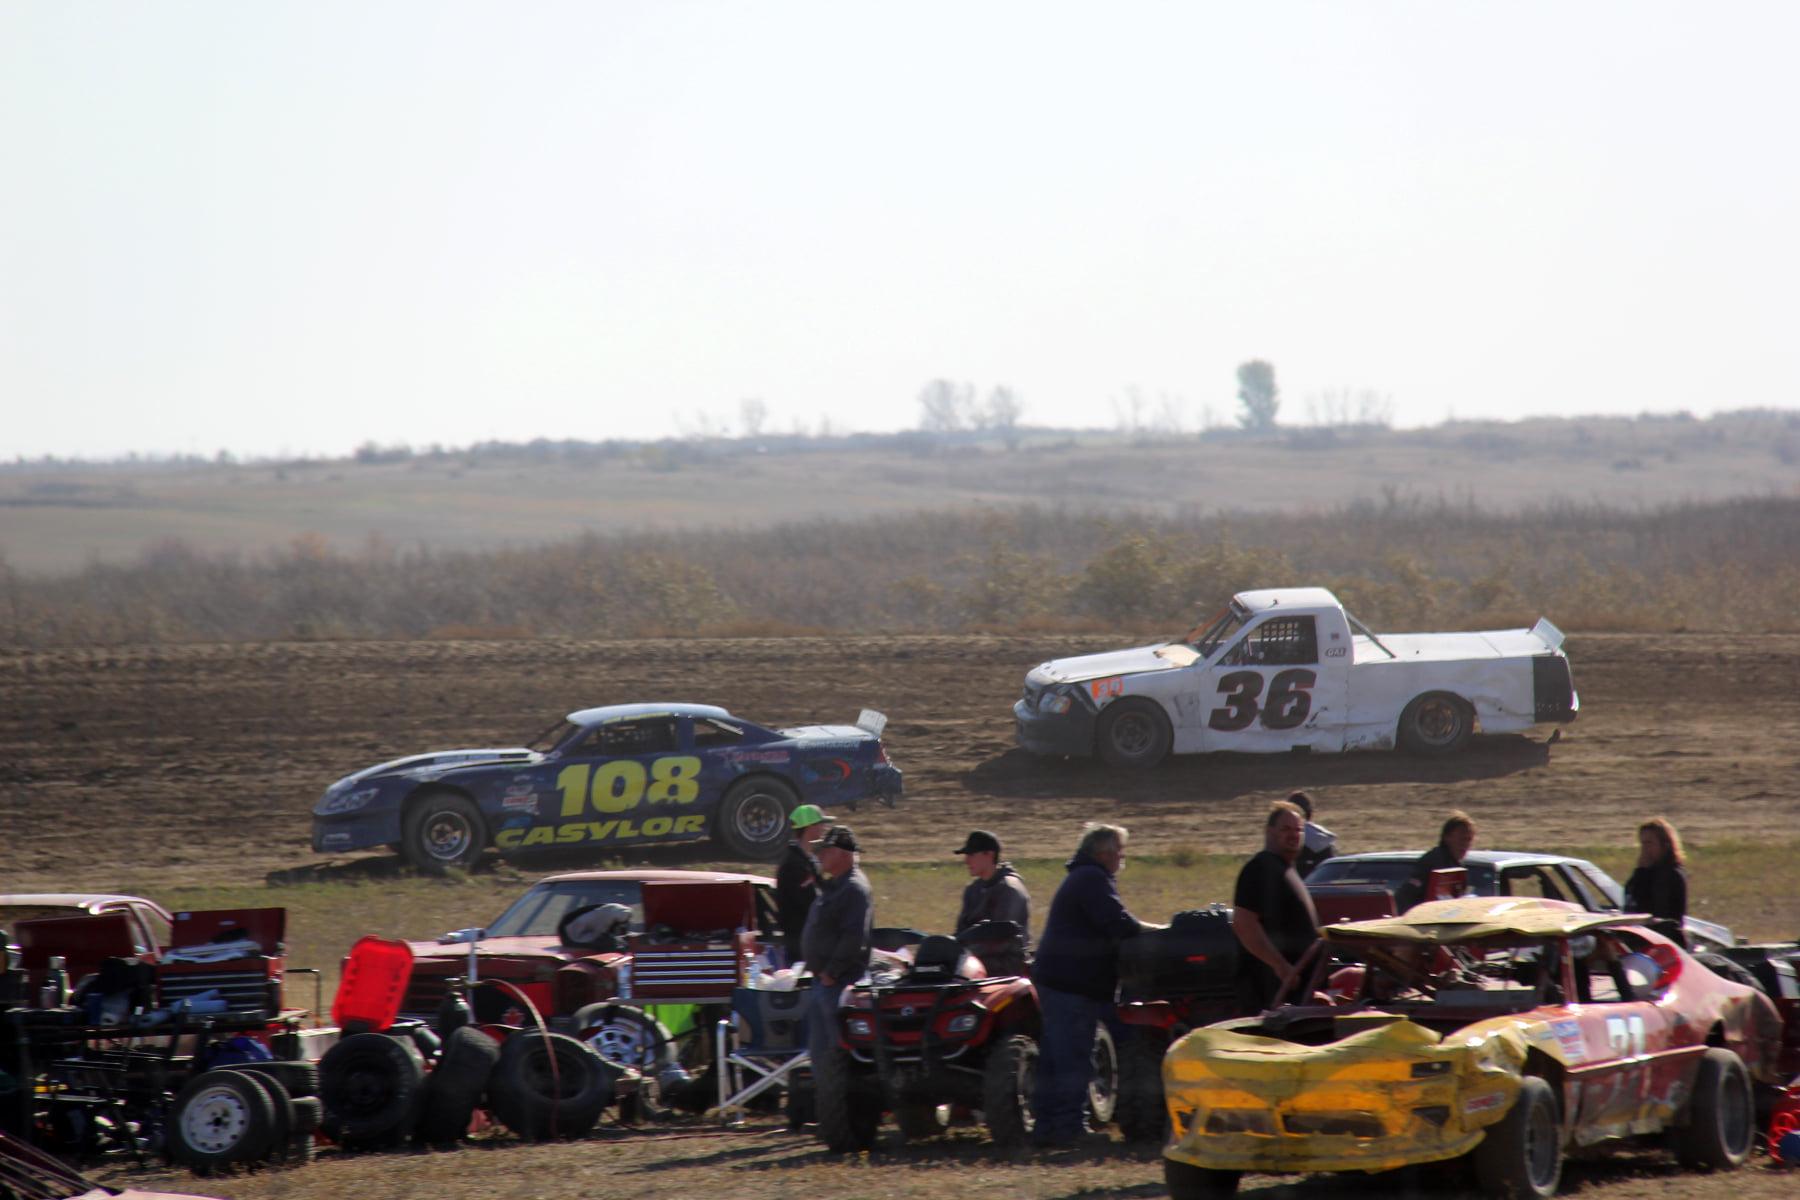 Outlook_Racing_Kemmer_Racing_Photography_7.jpg